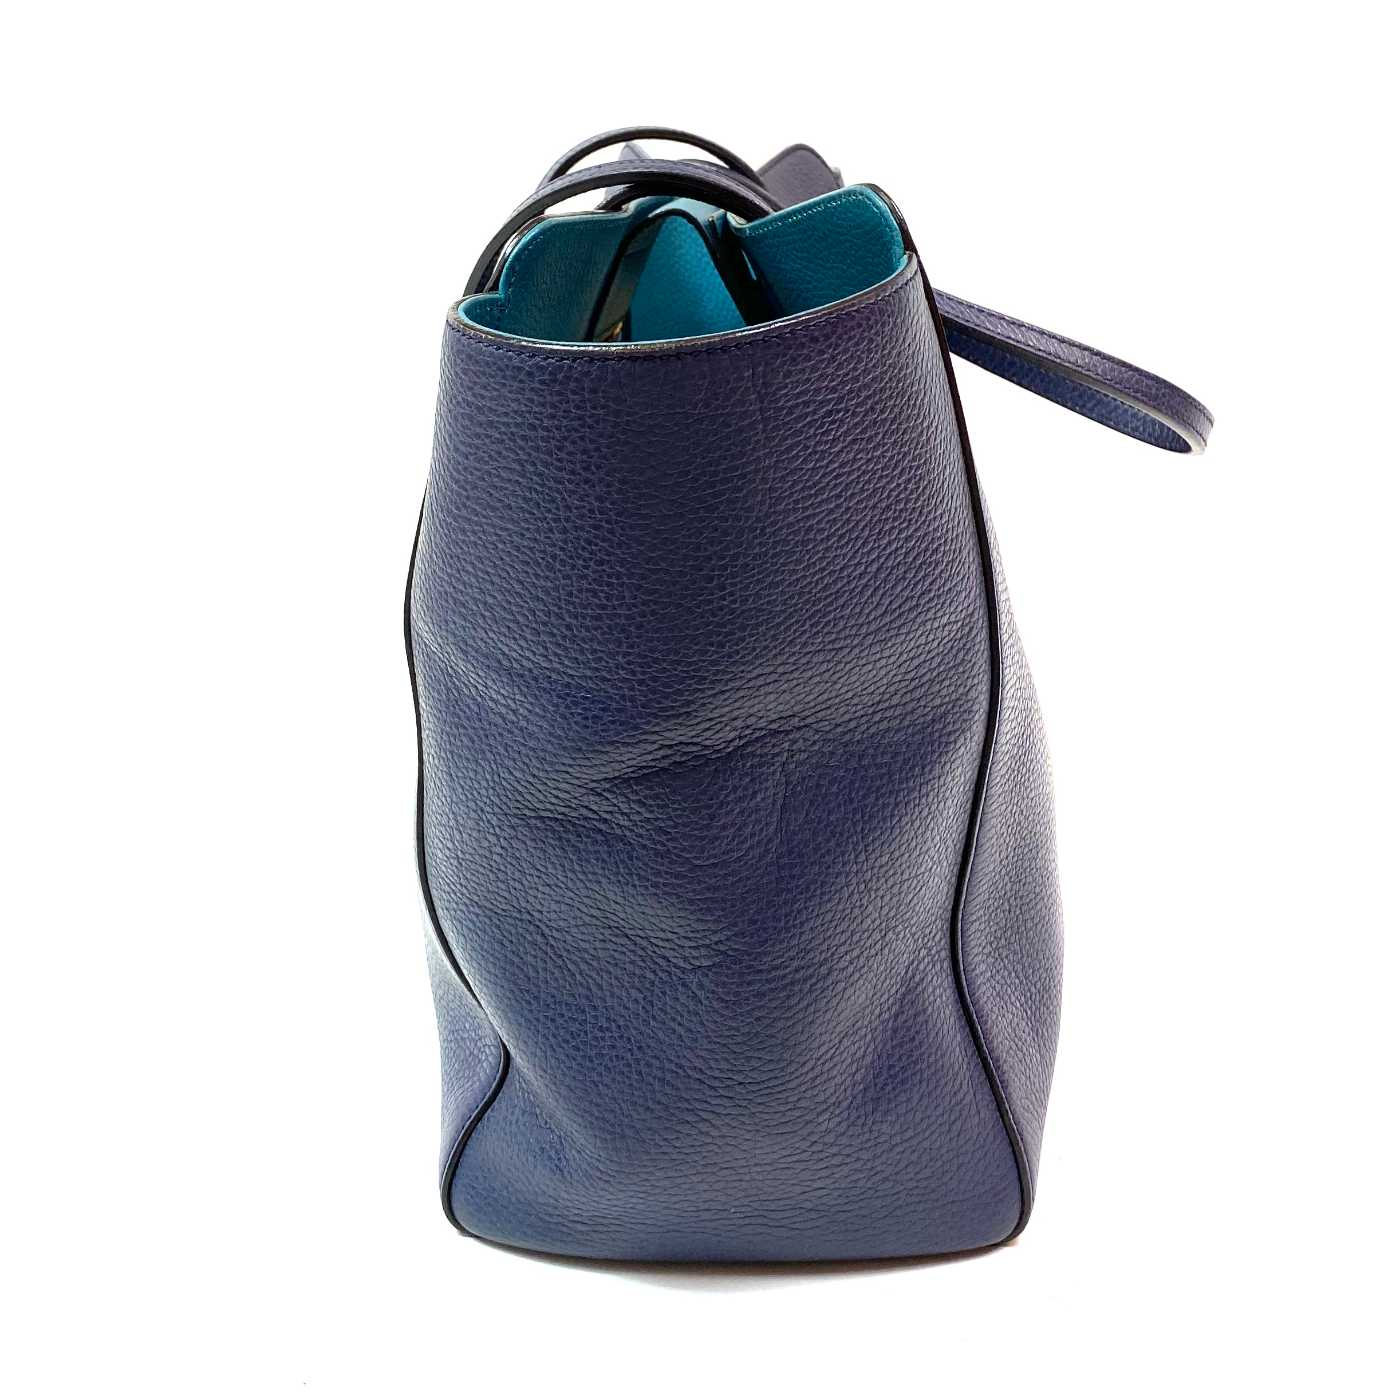 Bolsa Gucci Swing Azul